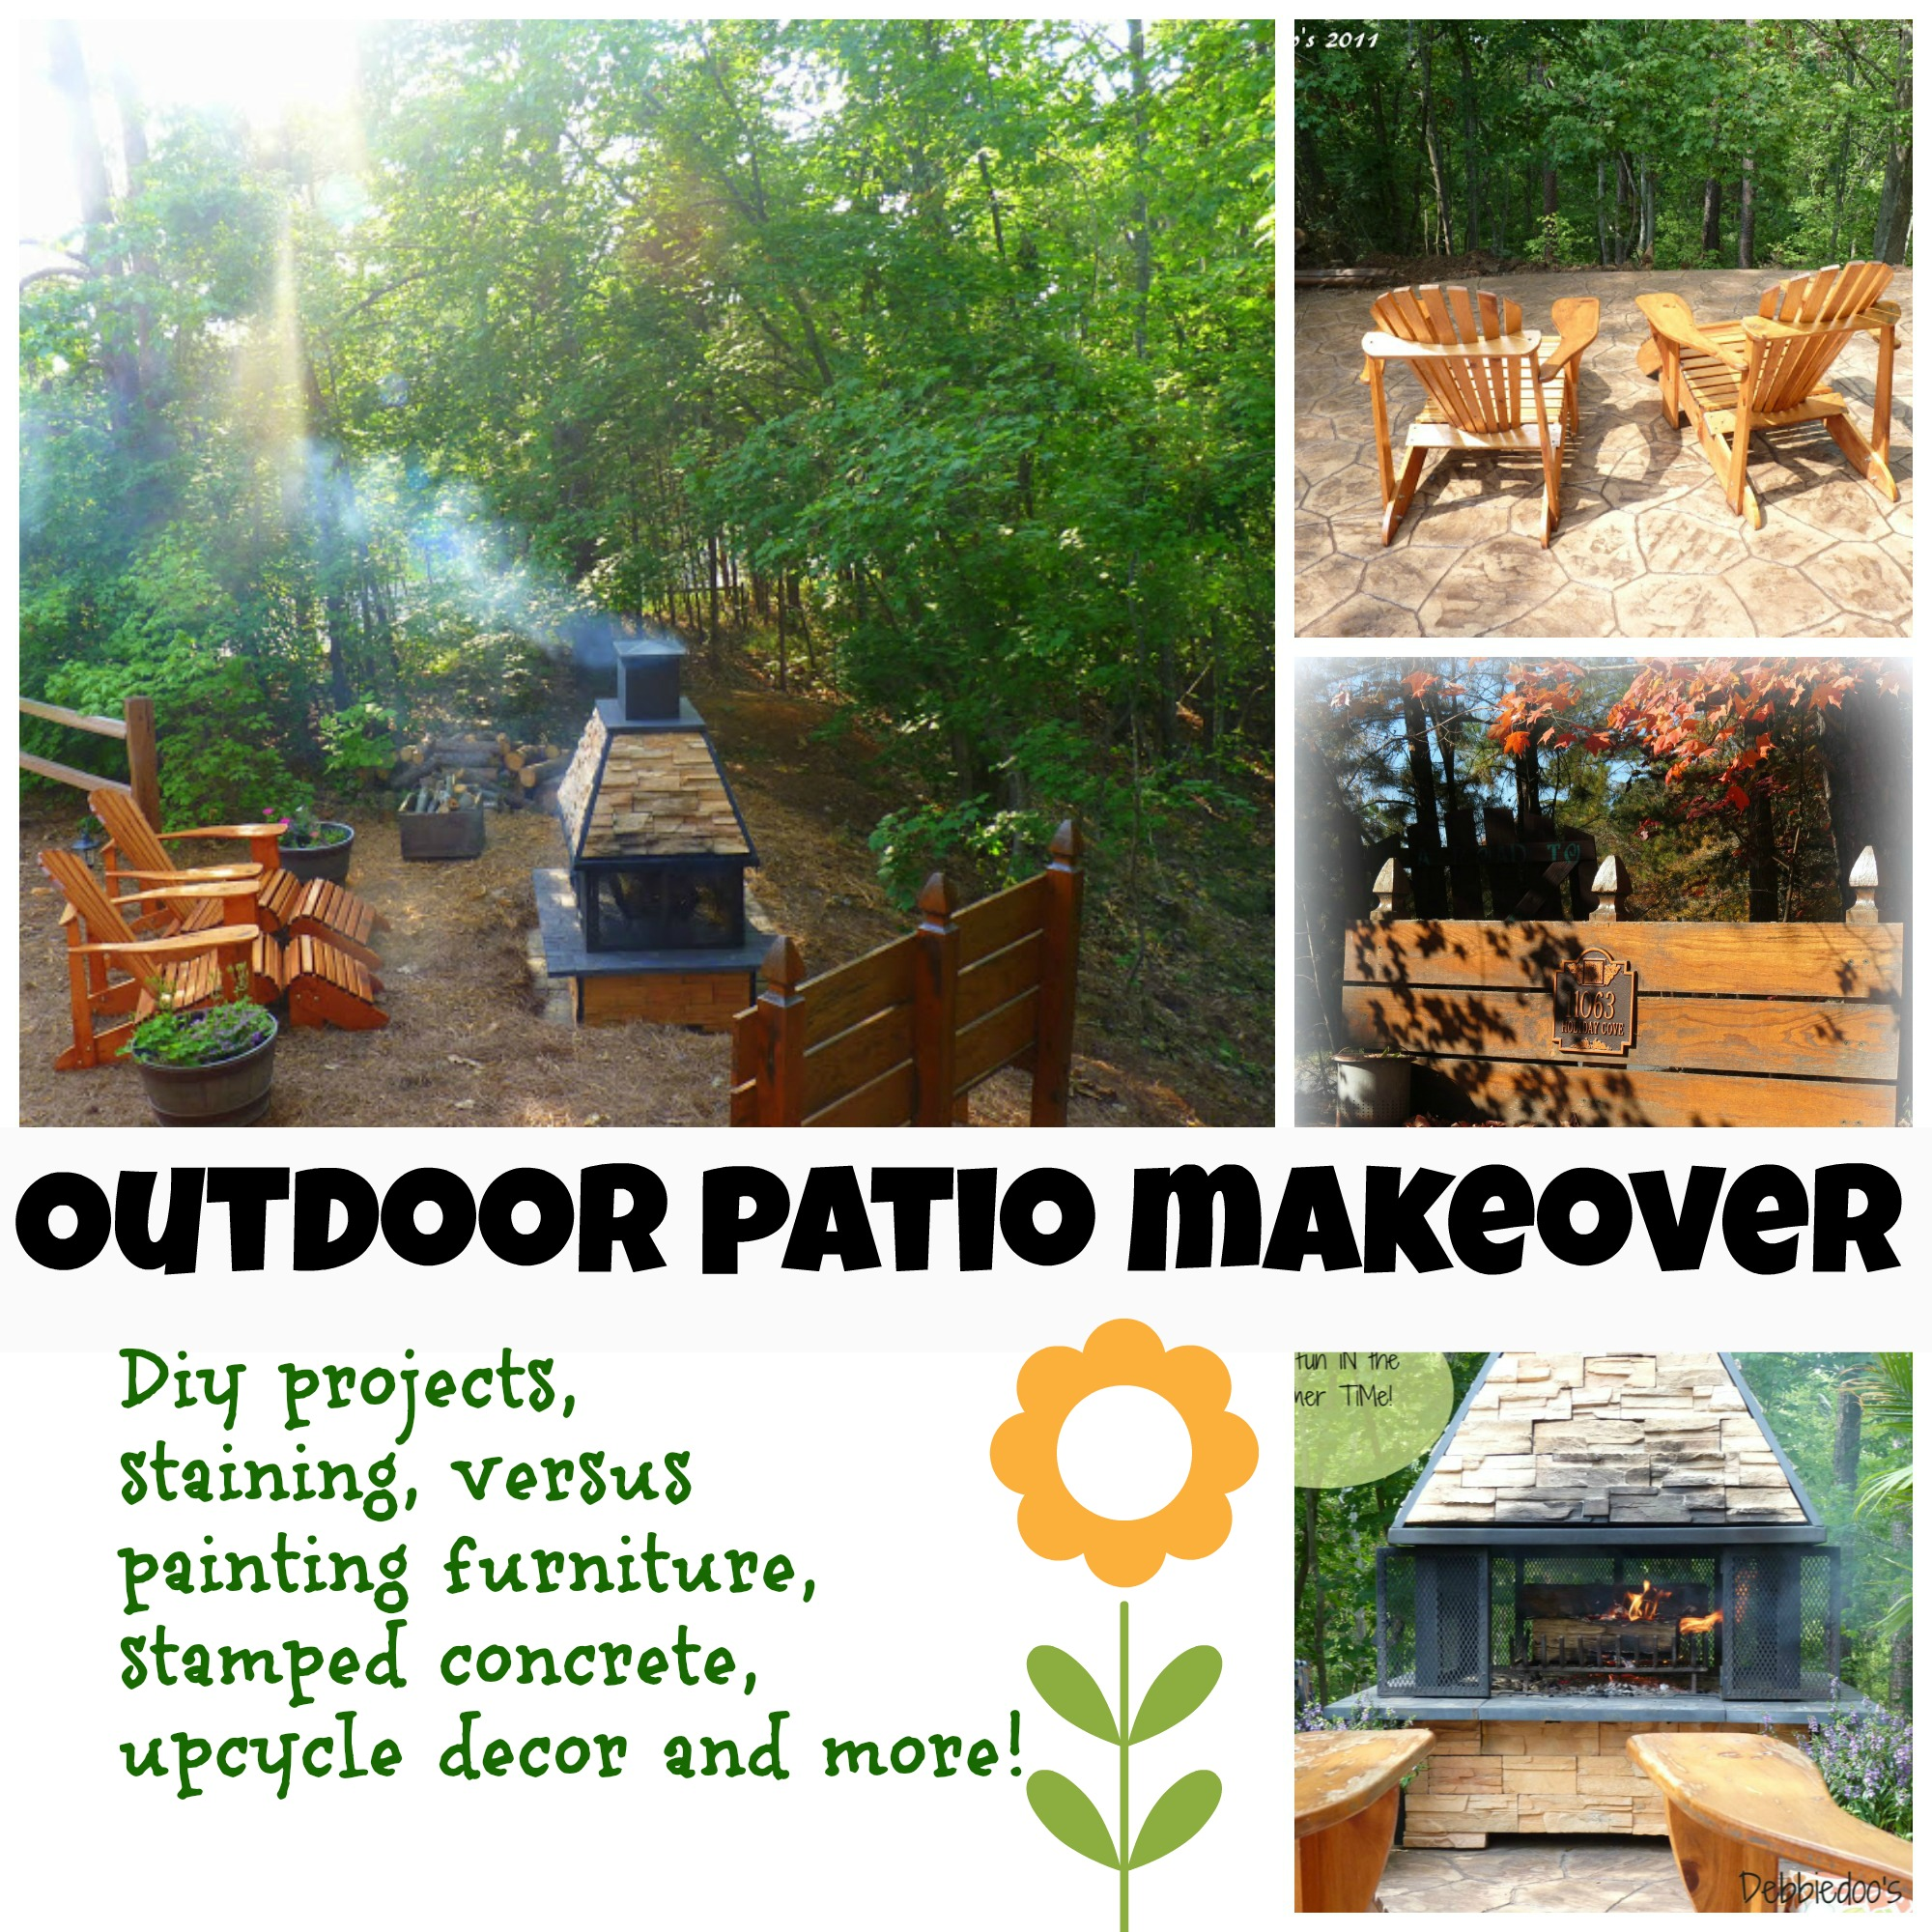 Outdoor patio makeoever